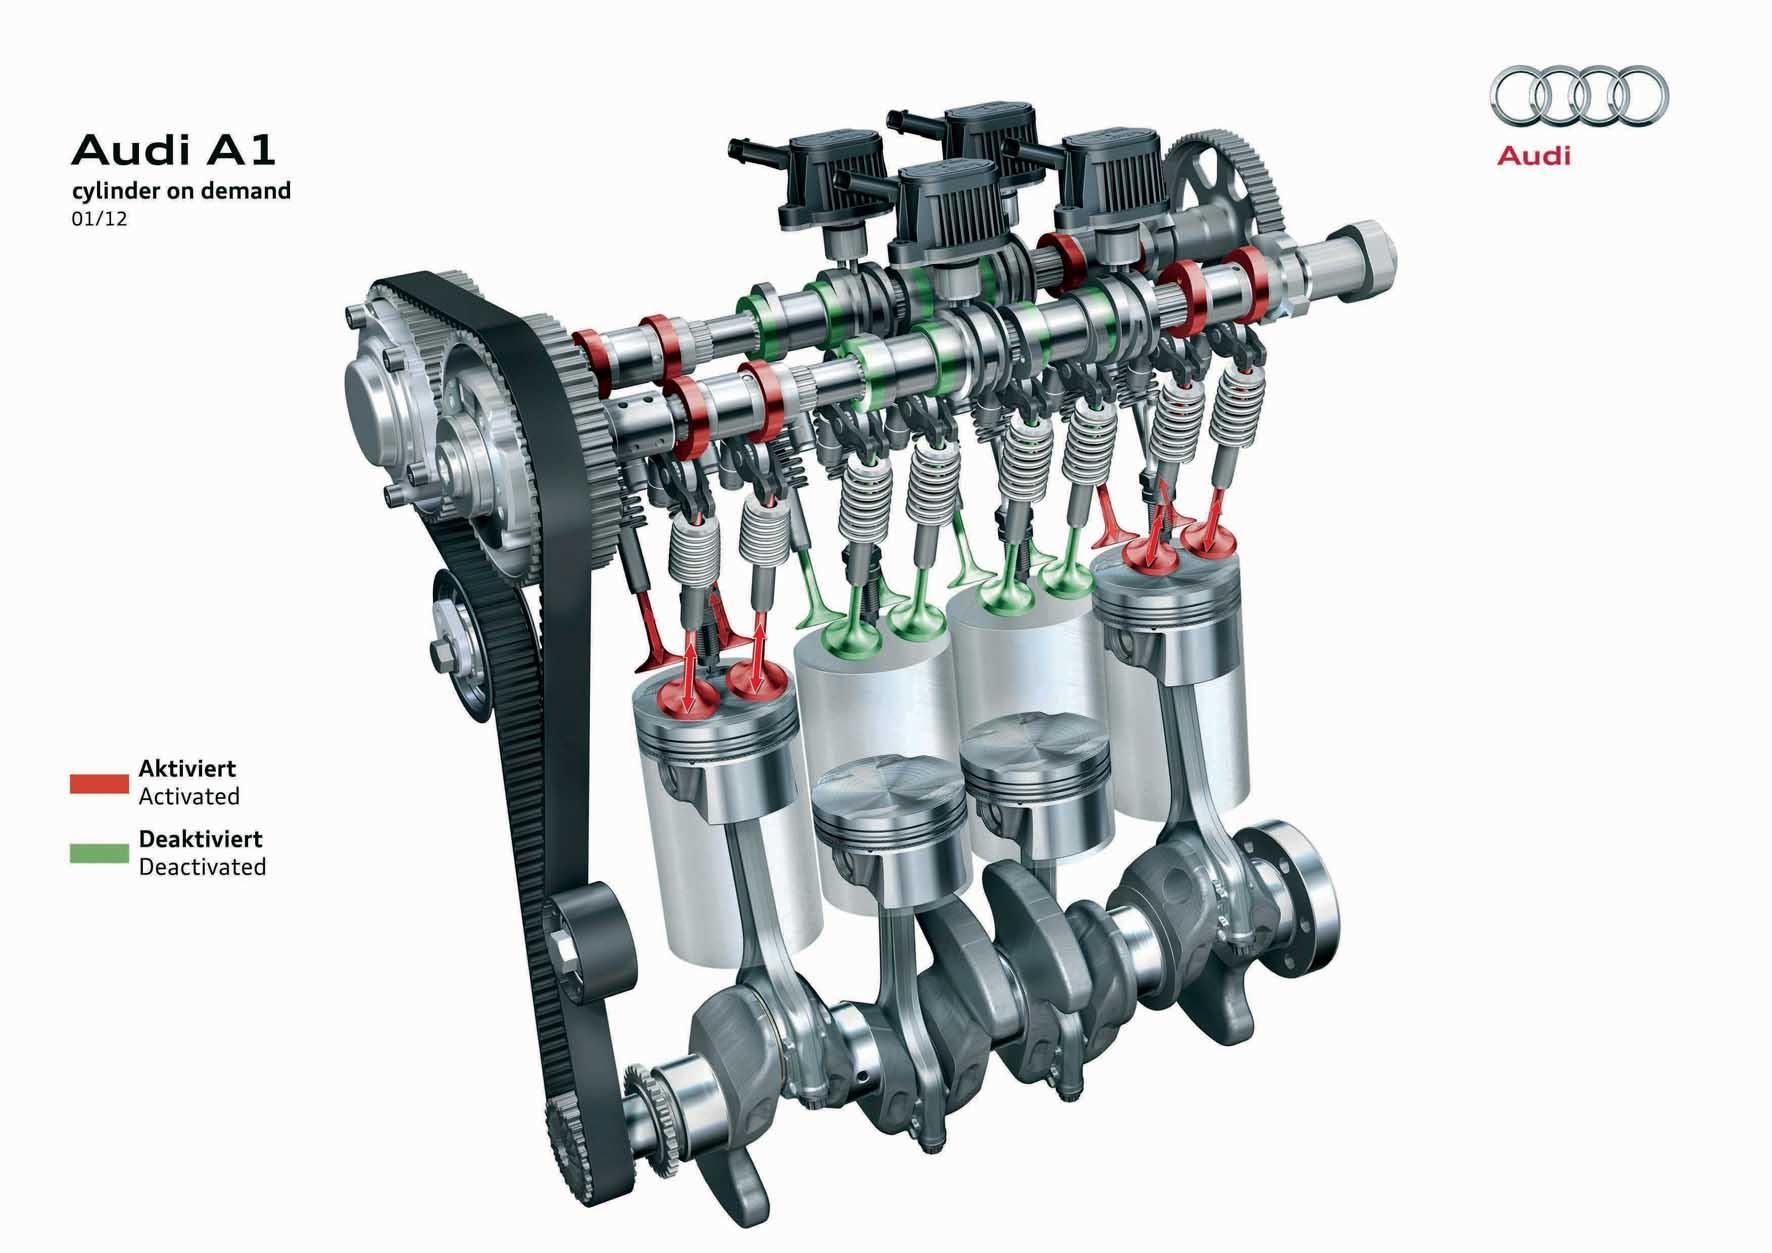 Audi-tecnologica-cyinder-on-demand-motori-4-cilindri-ilnordest